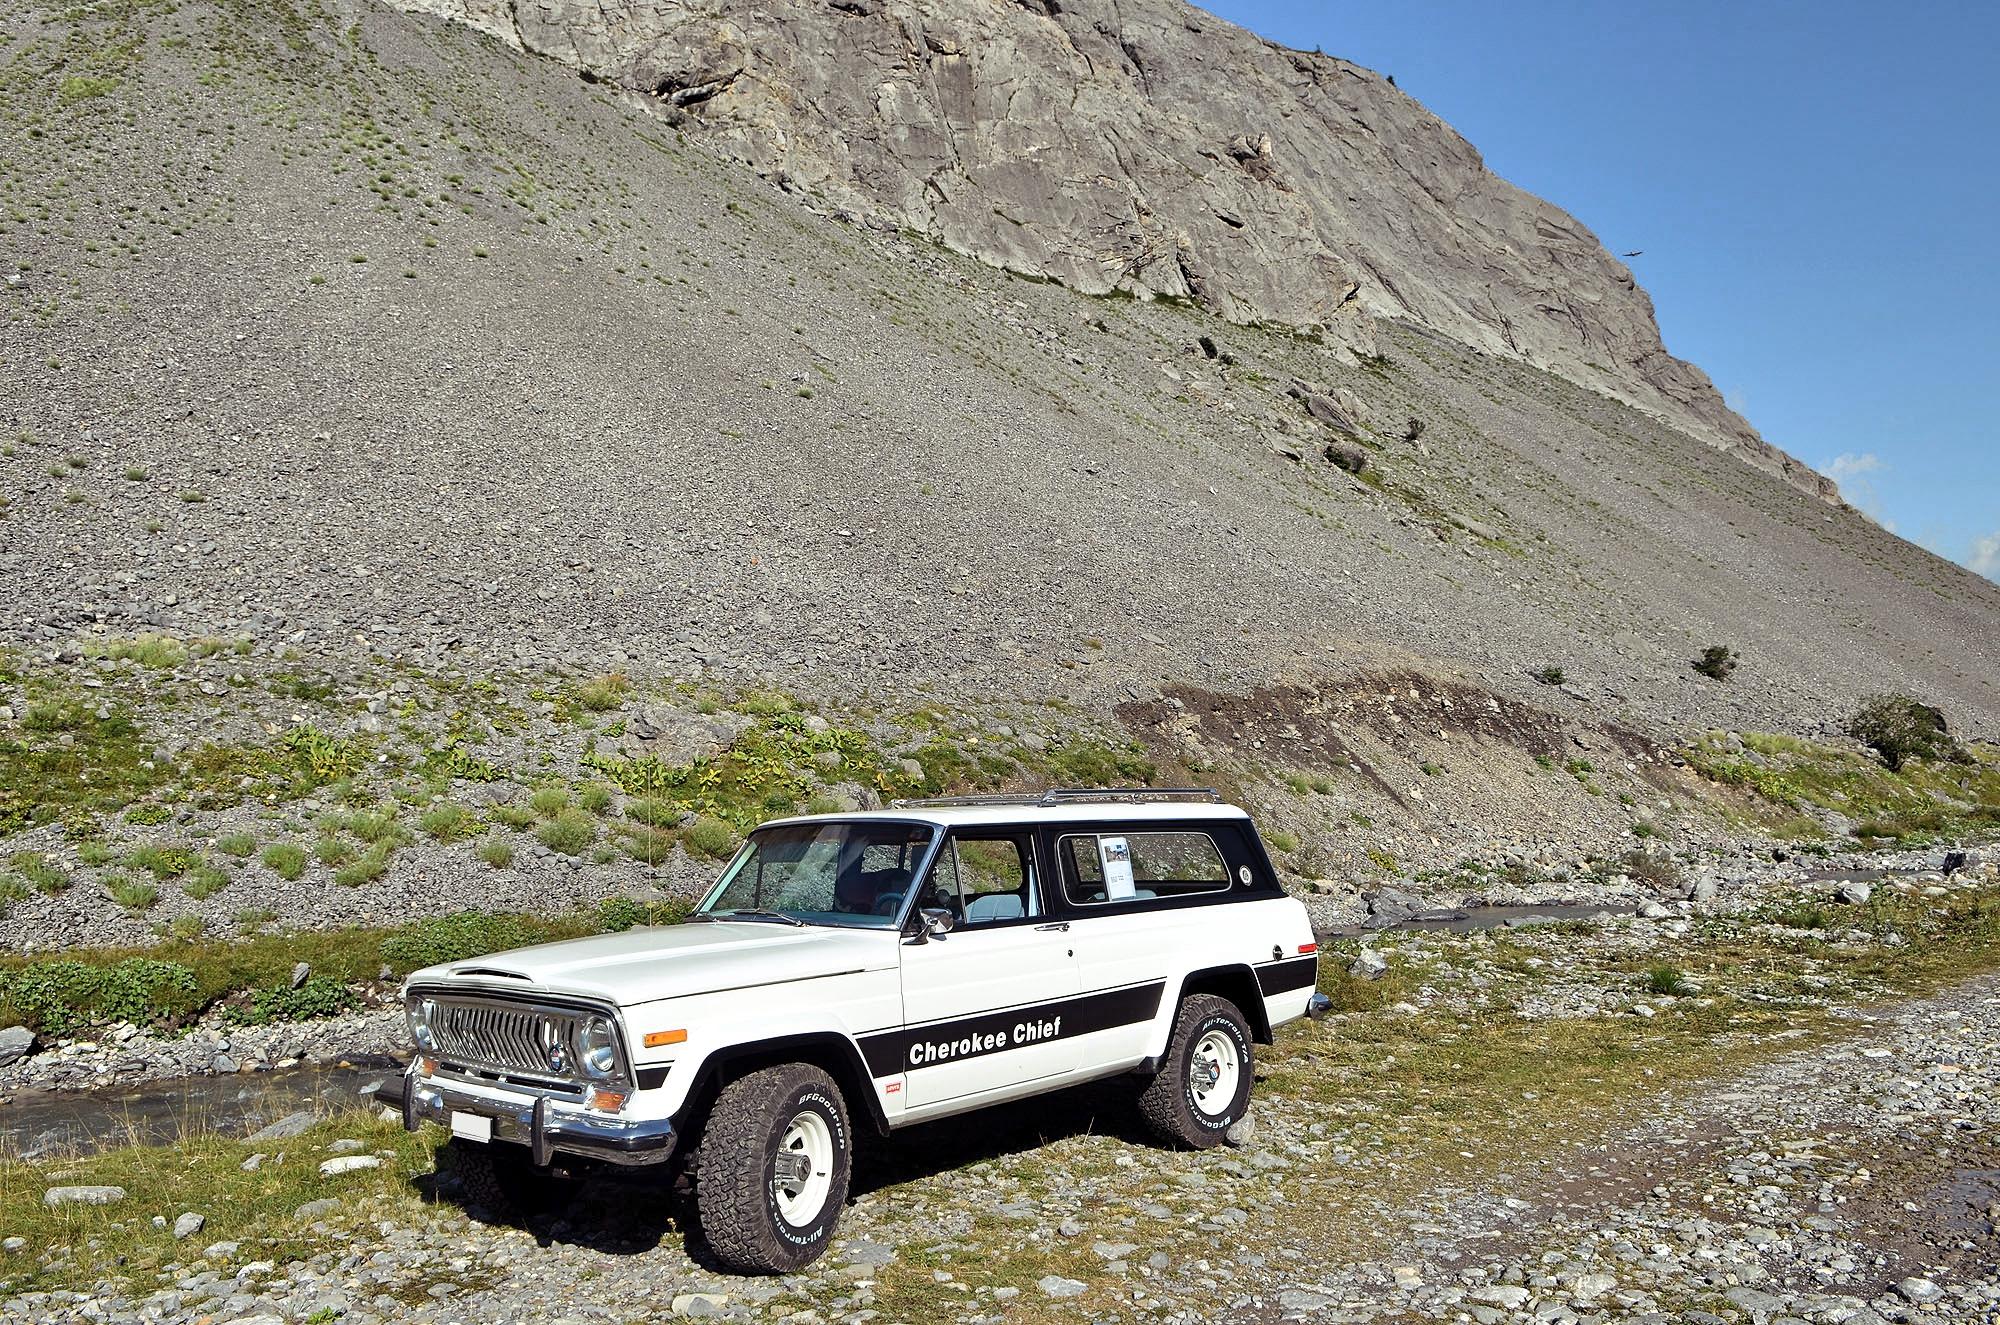 jeep-cherokee-chief-valloire-158.JPG